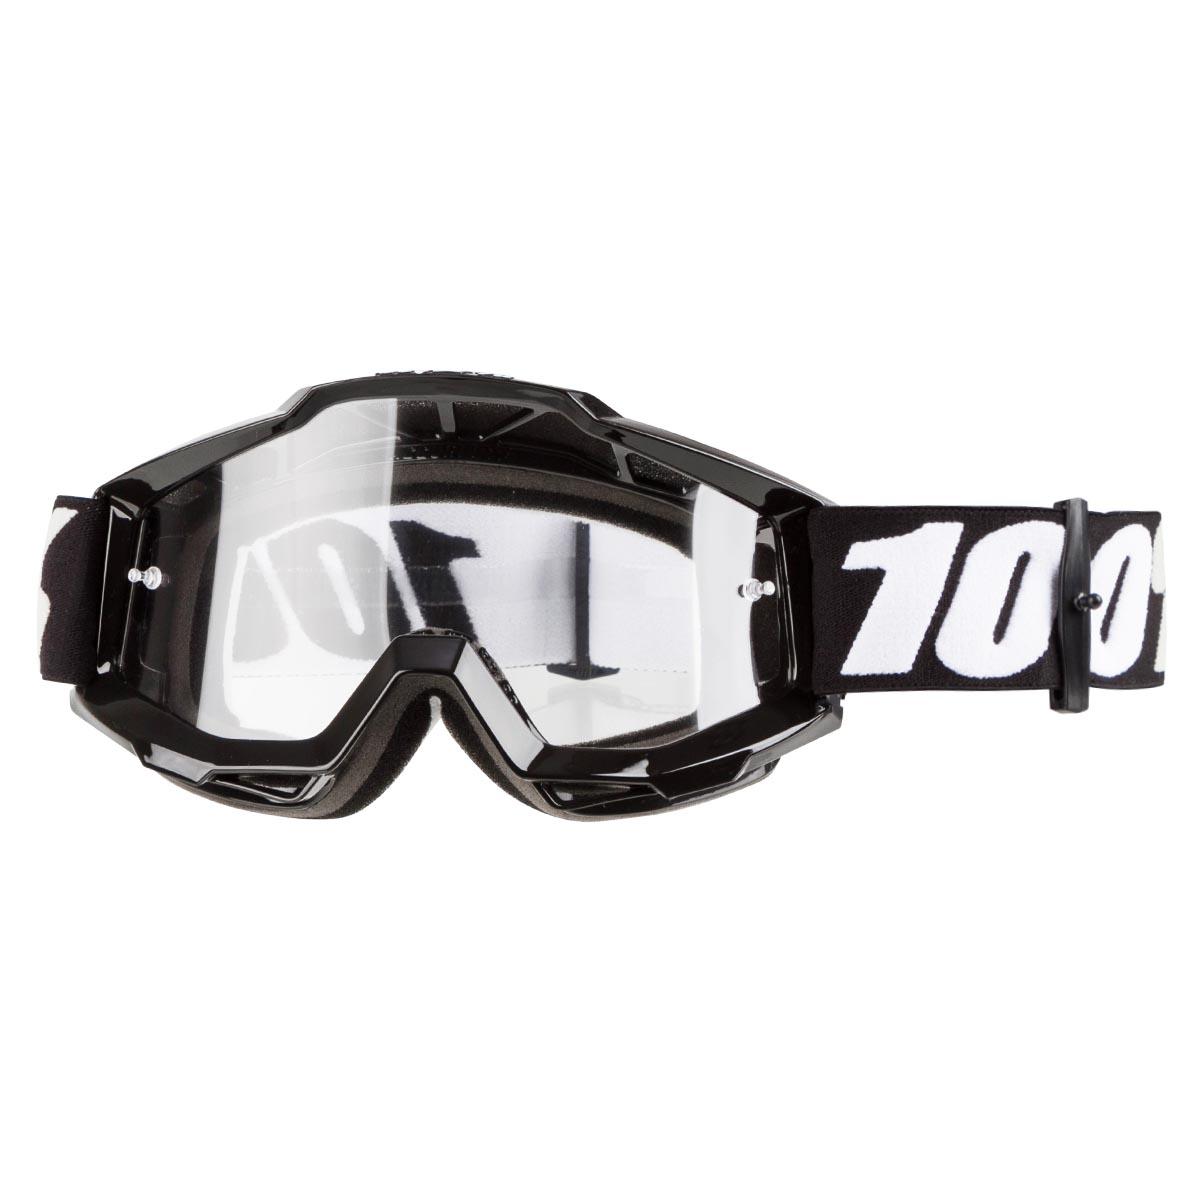 100% Crossbrille The Accuri Tornado, OTG - Klar Anti-Fog